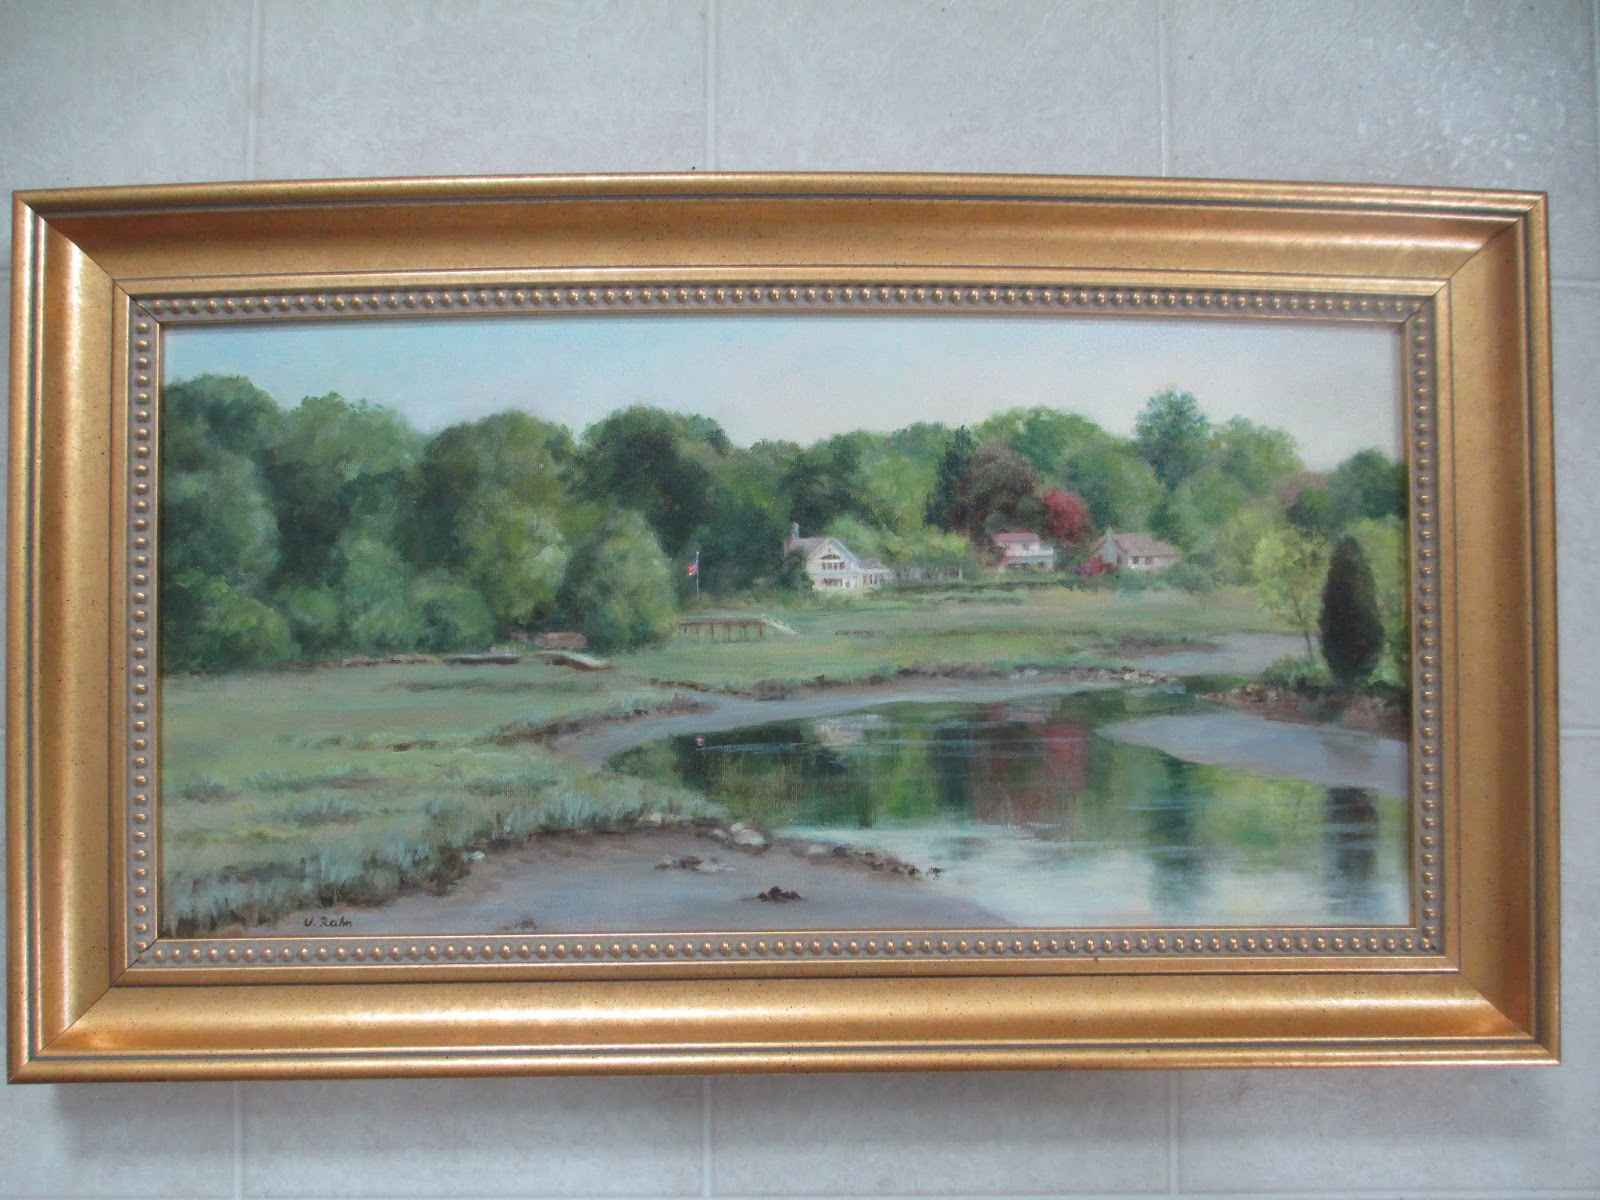 Farm Creek represented  by  Vera Rahn